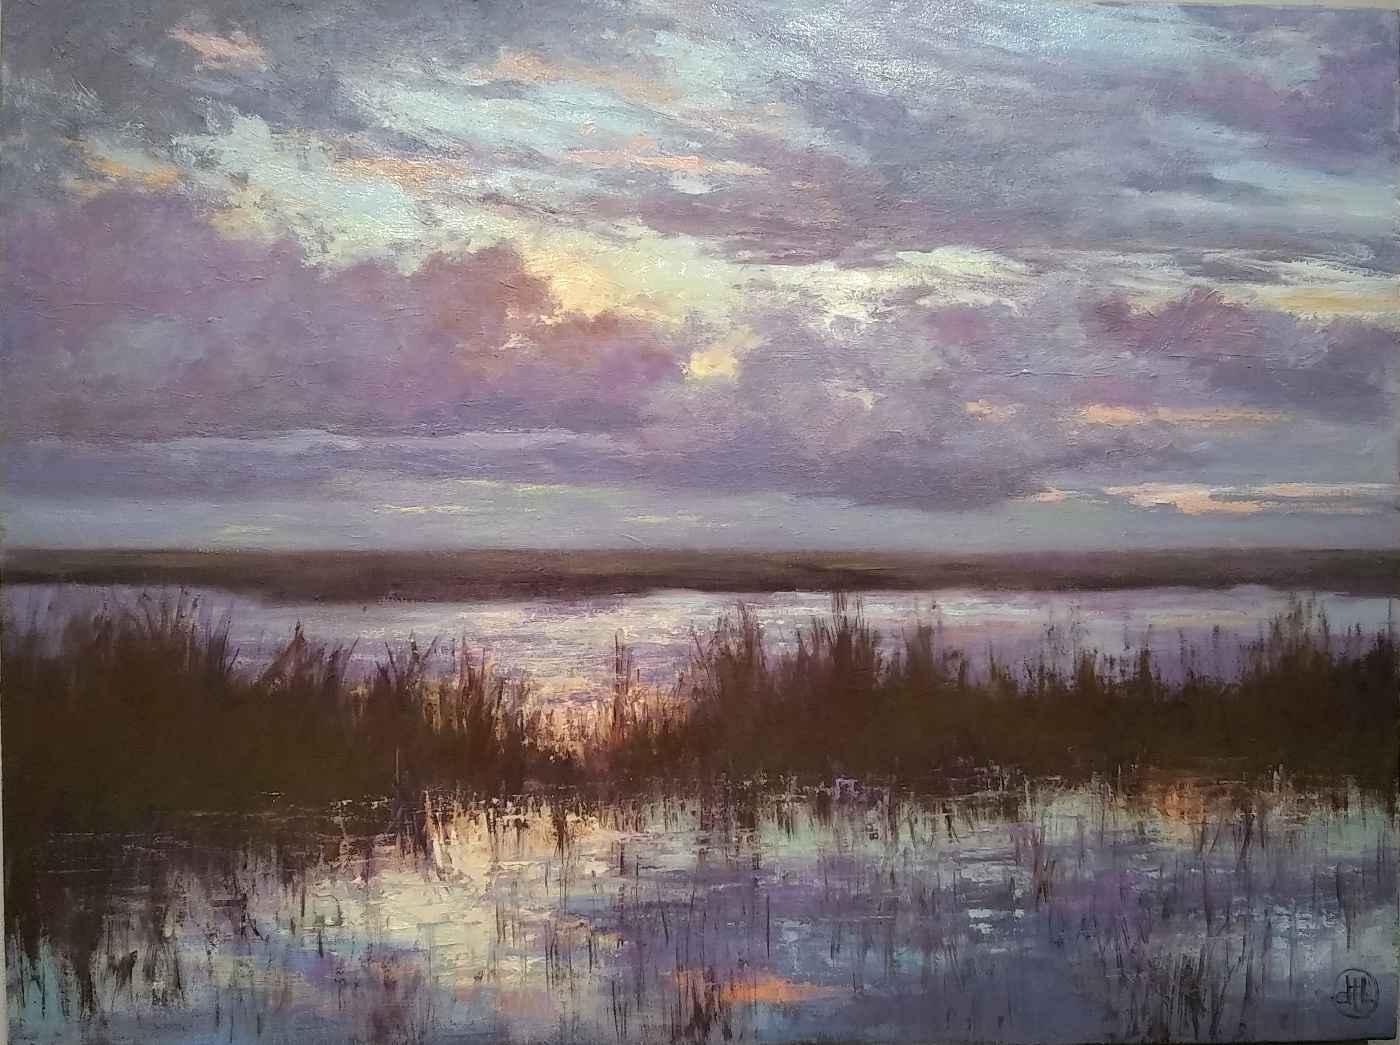 Moonshine by  Dottie Leatherwood - Masterpiece Online